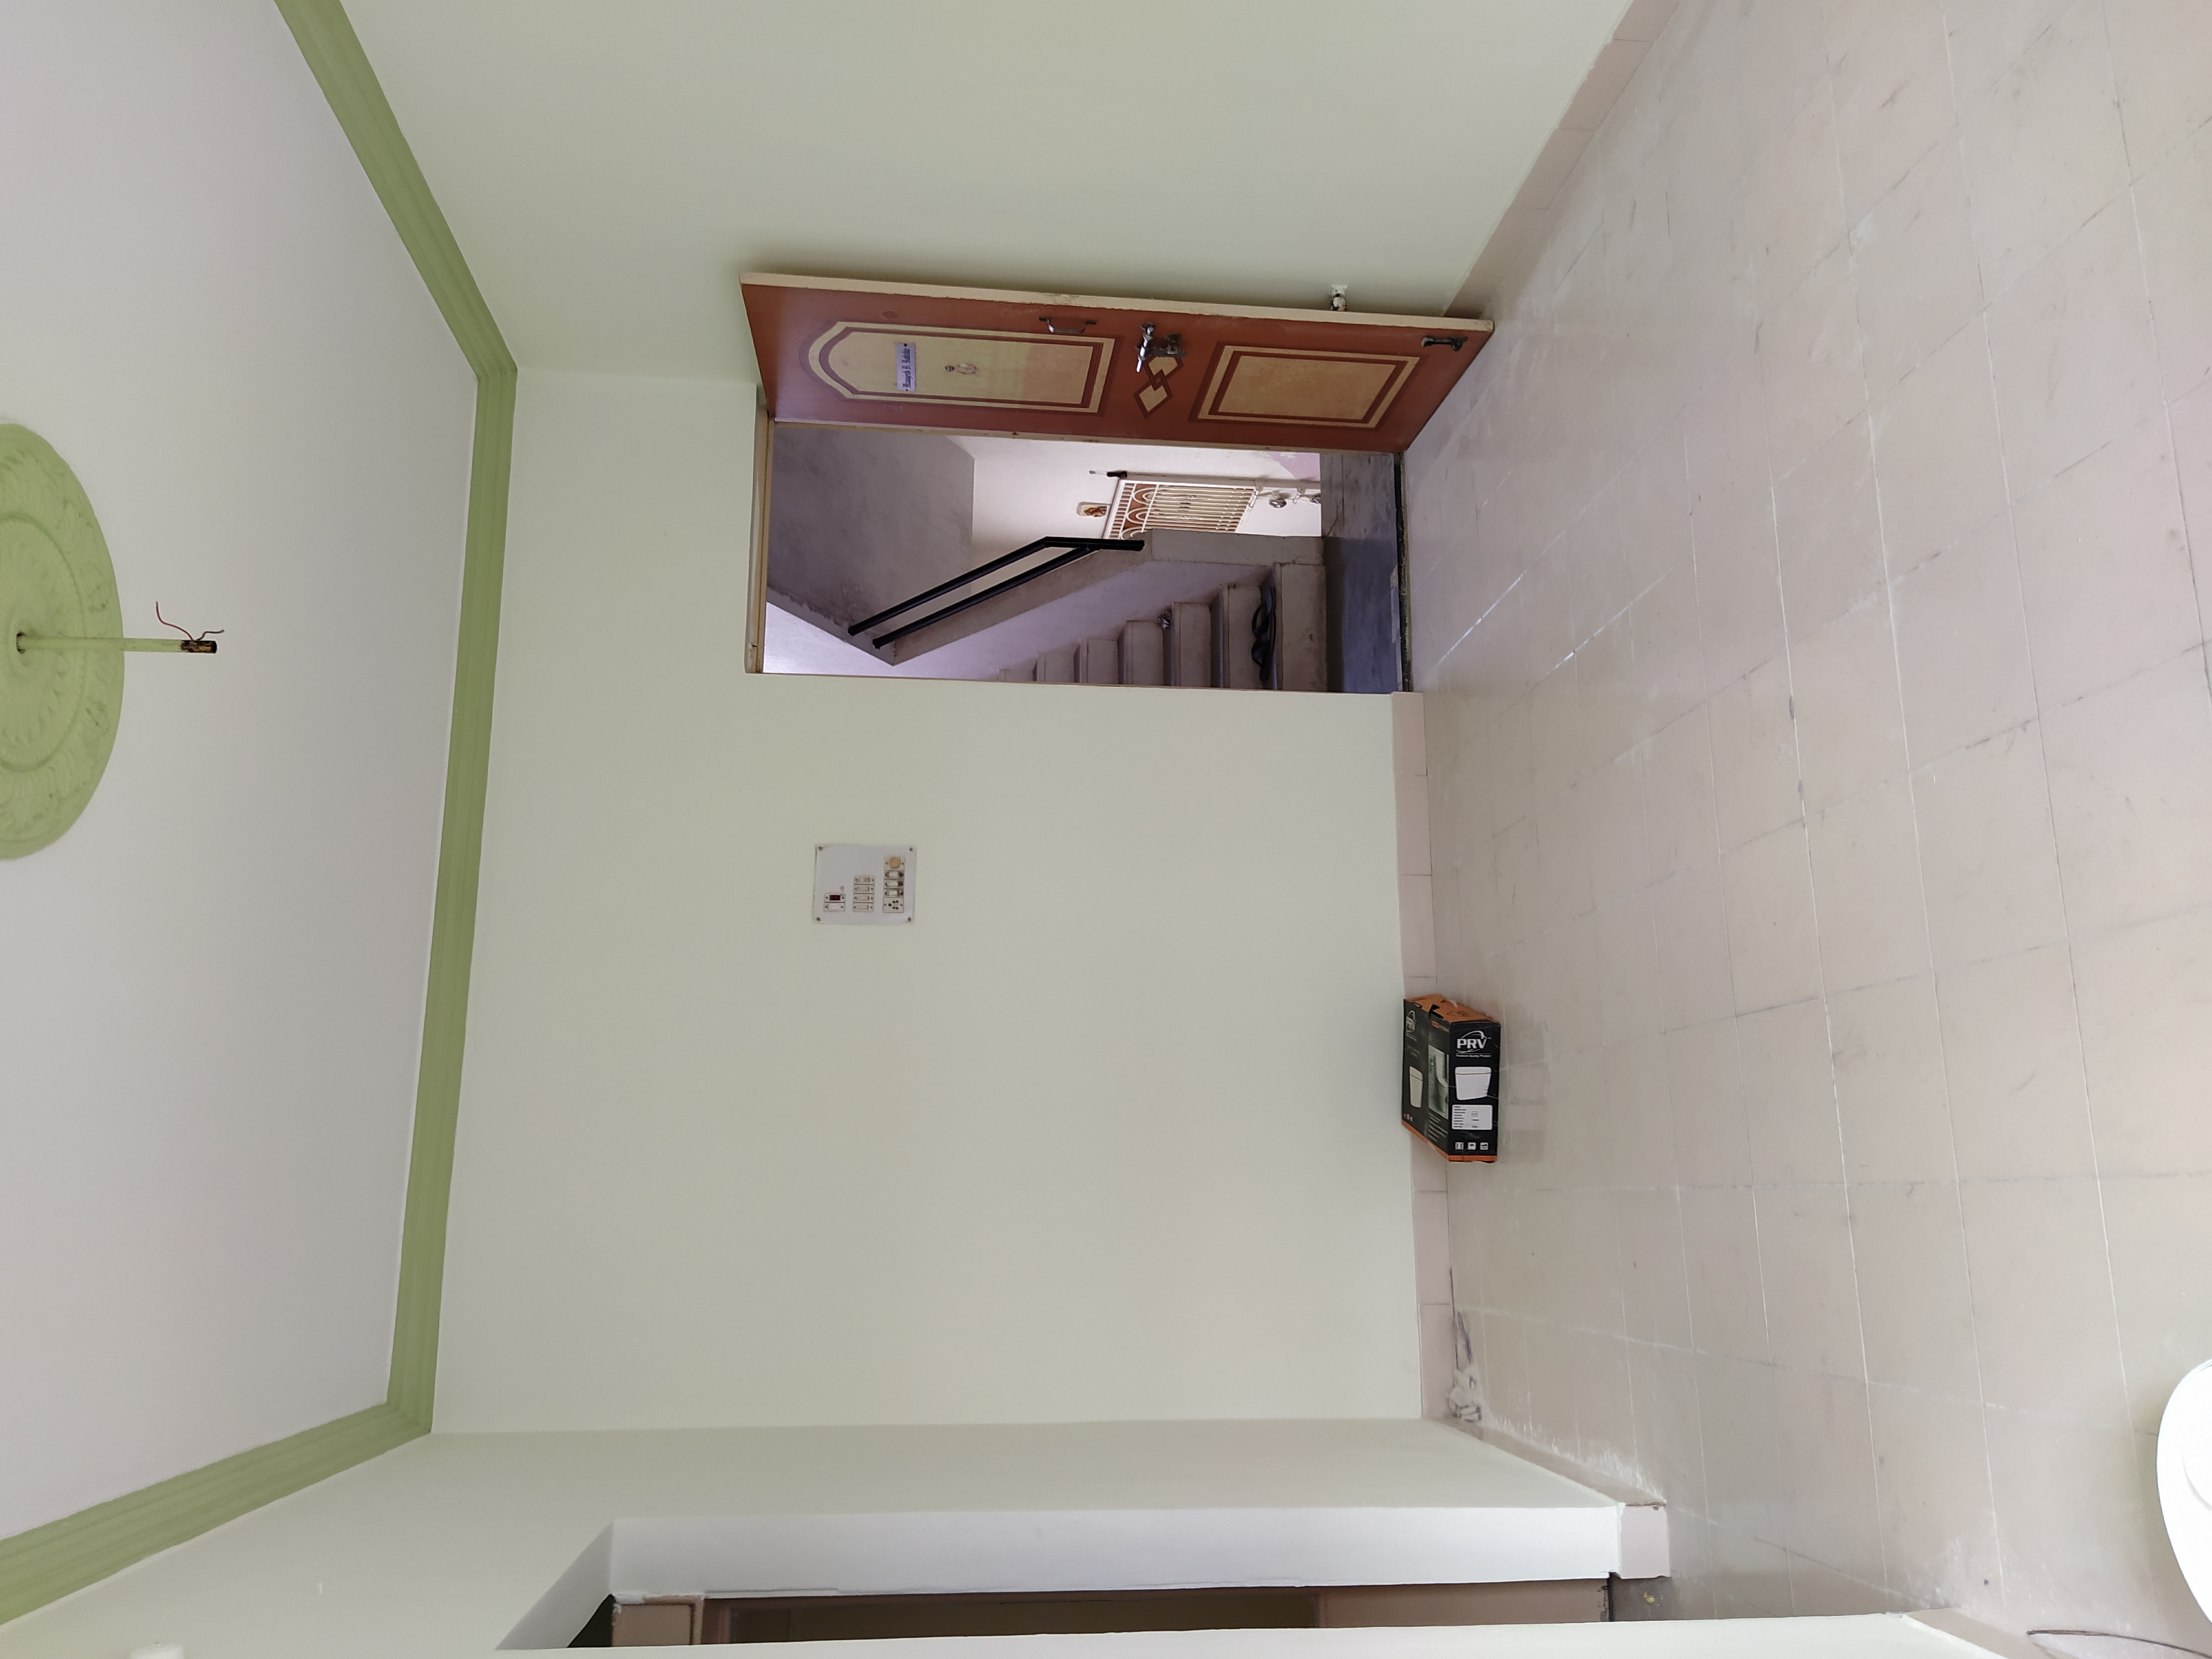 1 Rk Residential Apartment For Rent In Shree Apartment Bhosari Pimpri Chinchwad 600 Sq Feet 8000